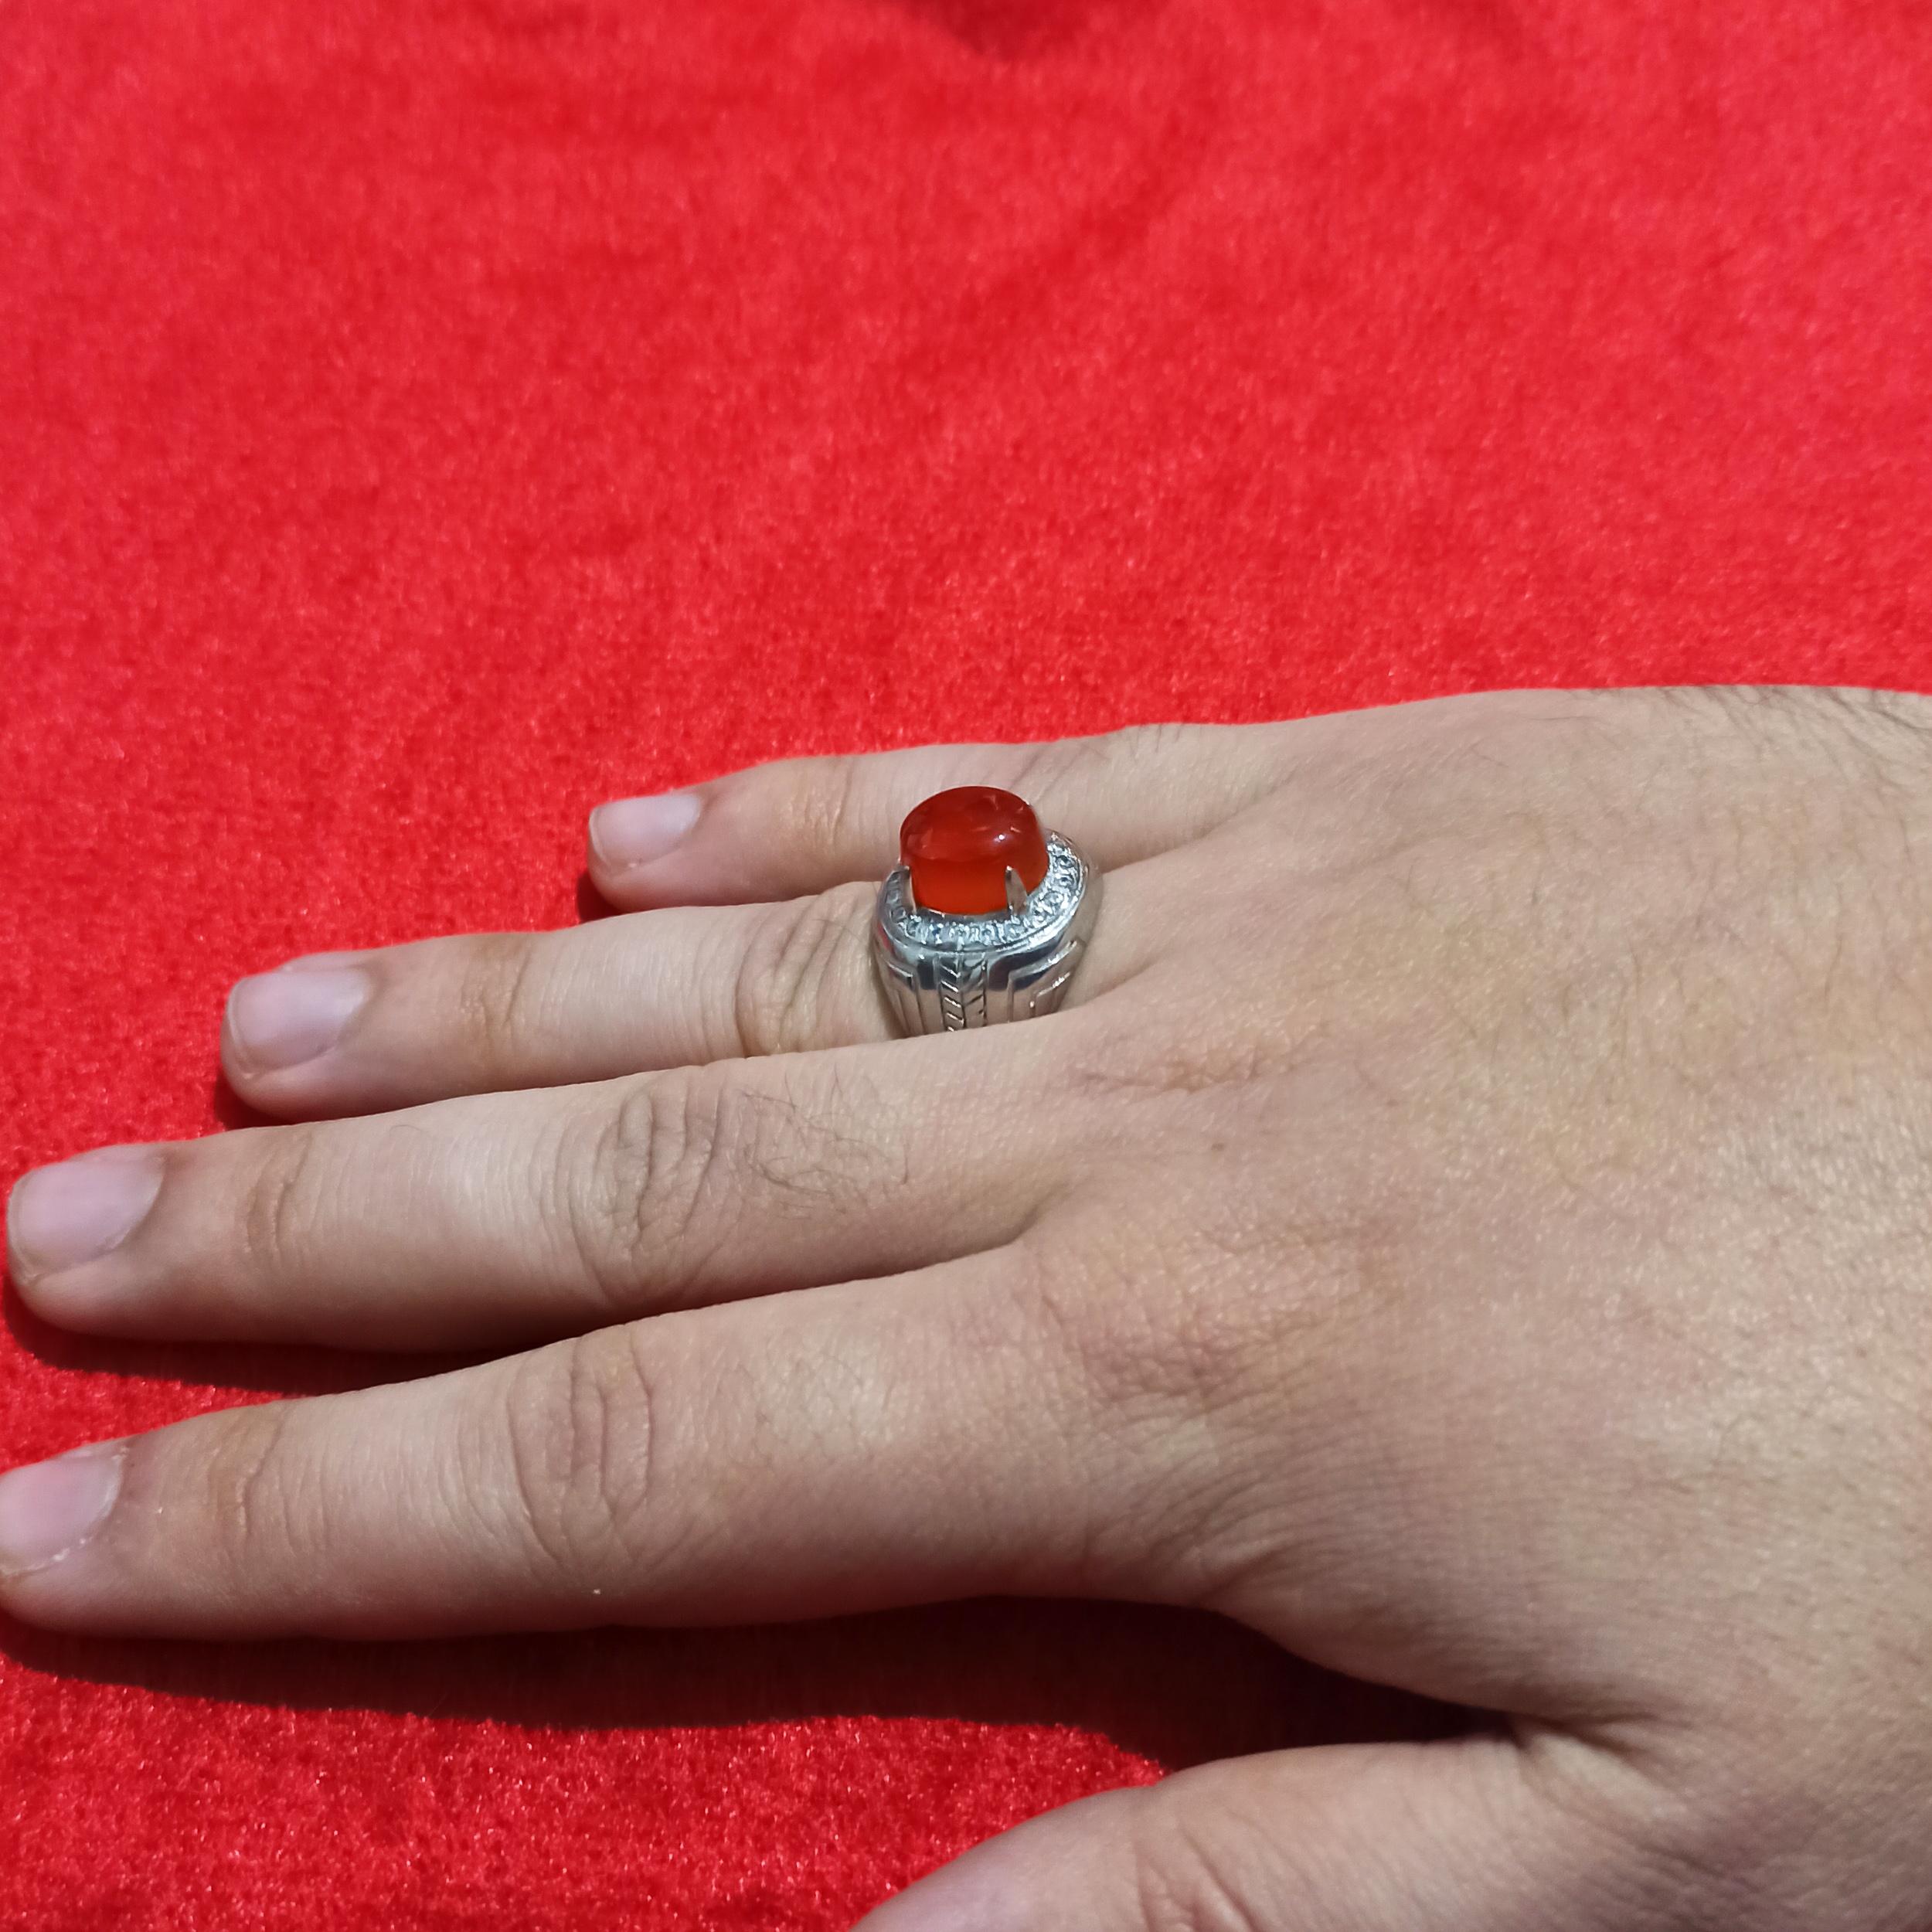 انگشتر نقره مردانه سلین کالا مدل عقیق ce-sha3